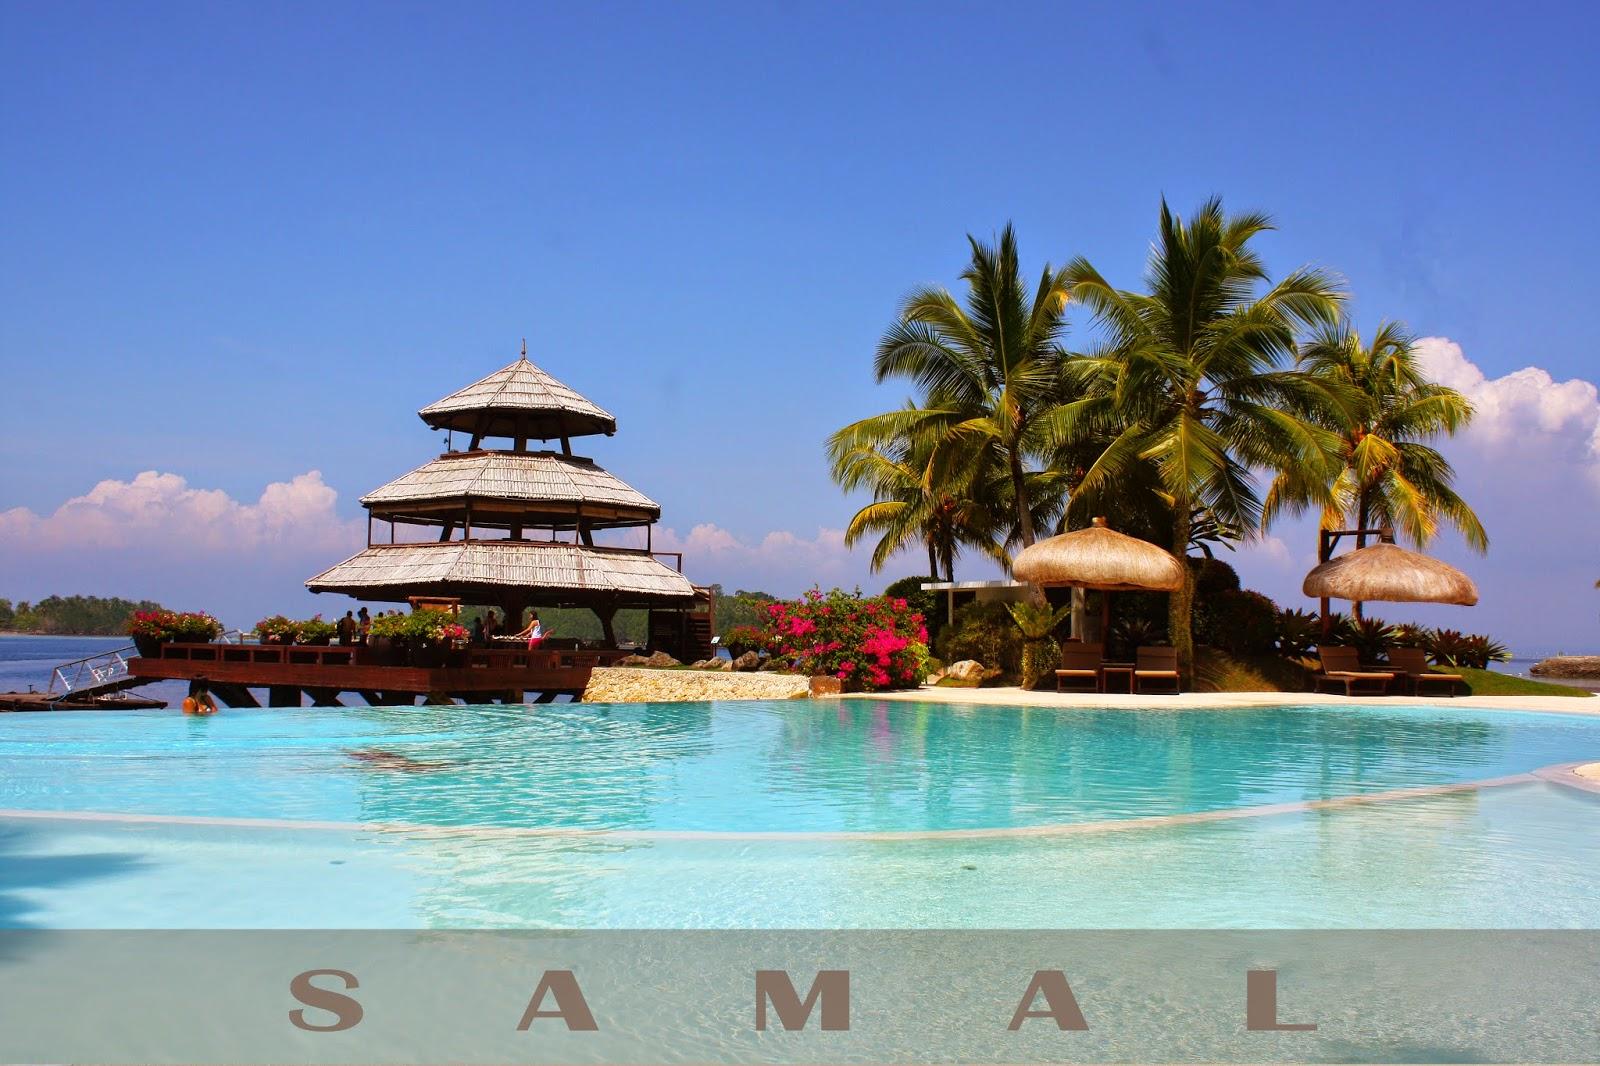 Pearl Farm Beach Resort, one of the top beach resorts in Samal